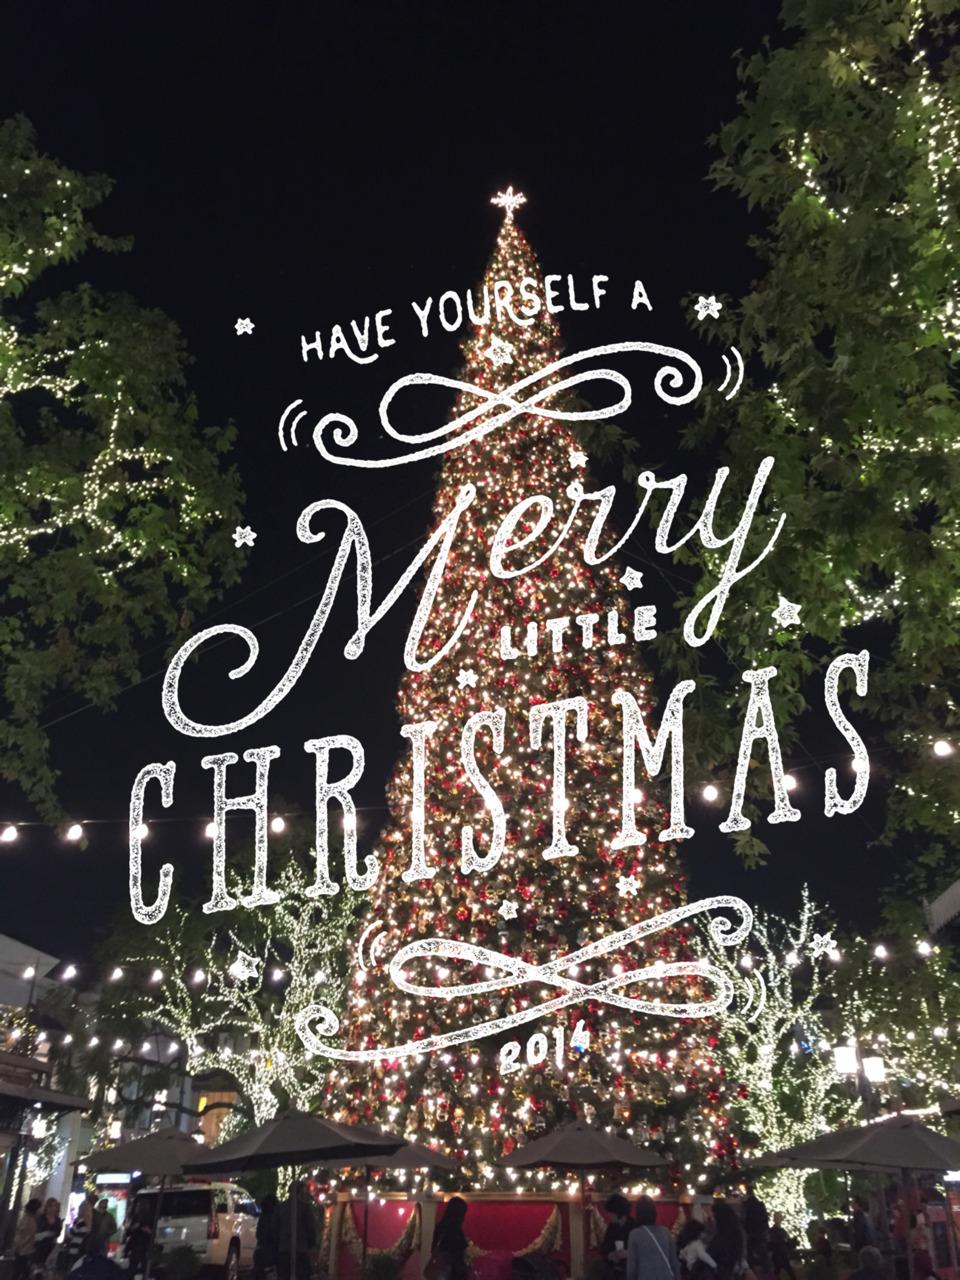 Merry Merry! xo -A